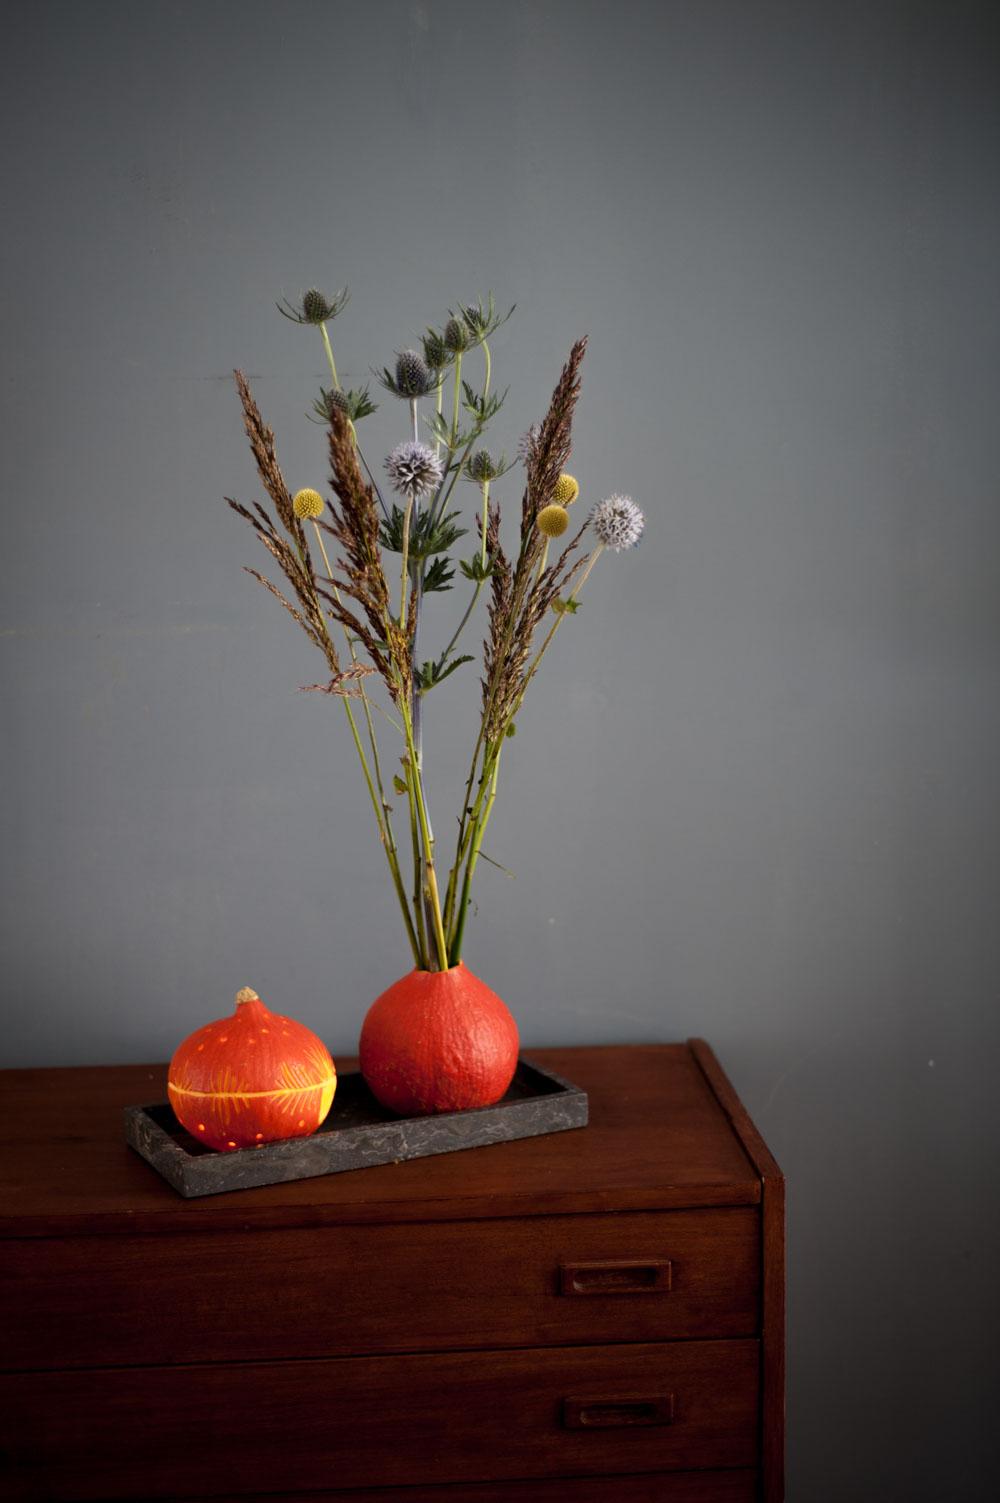 Kürbis als Vase